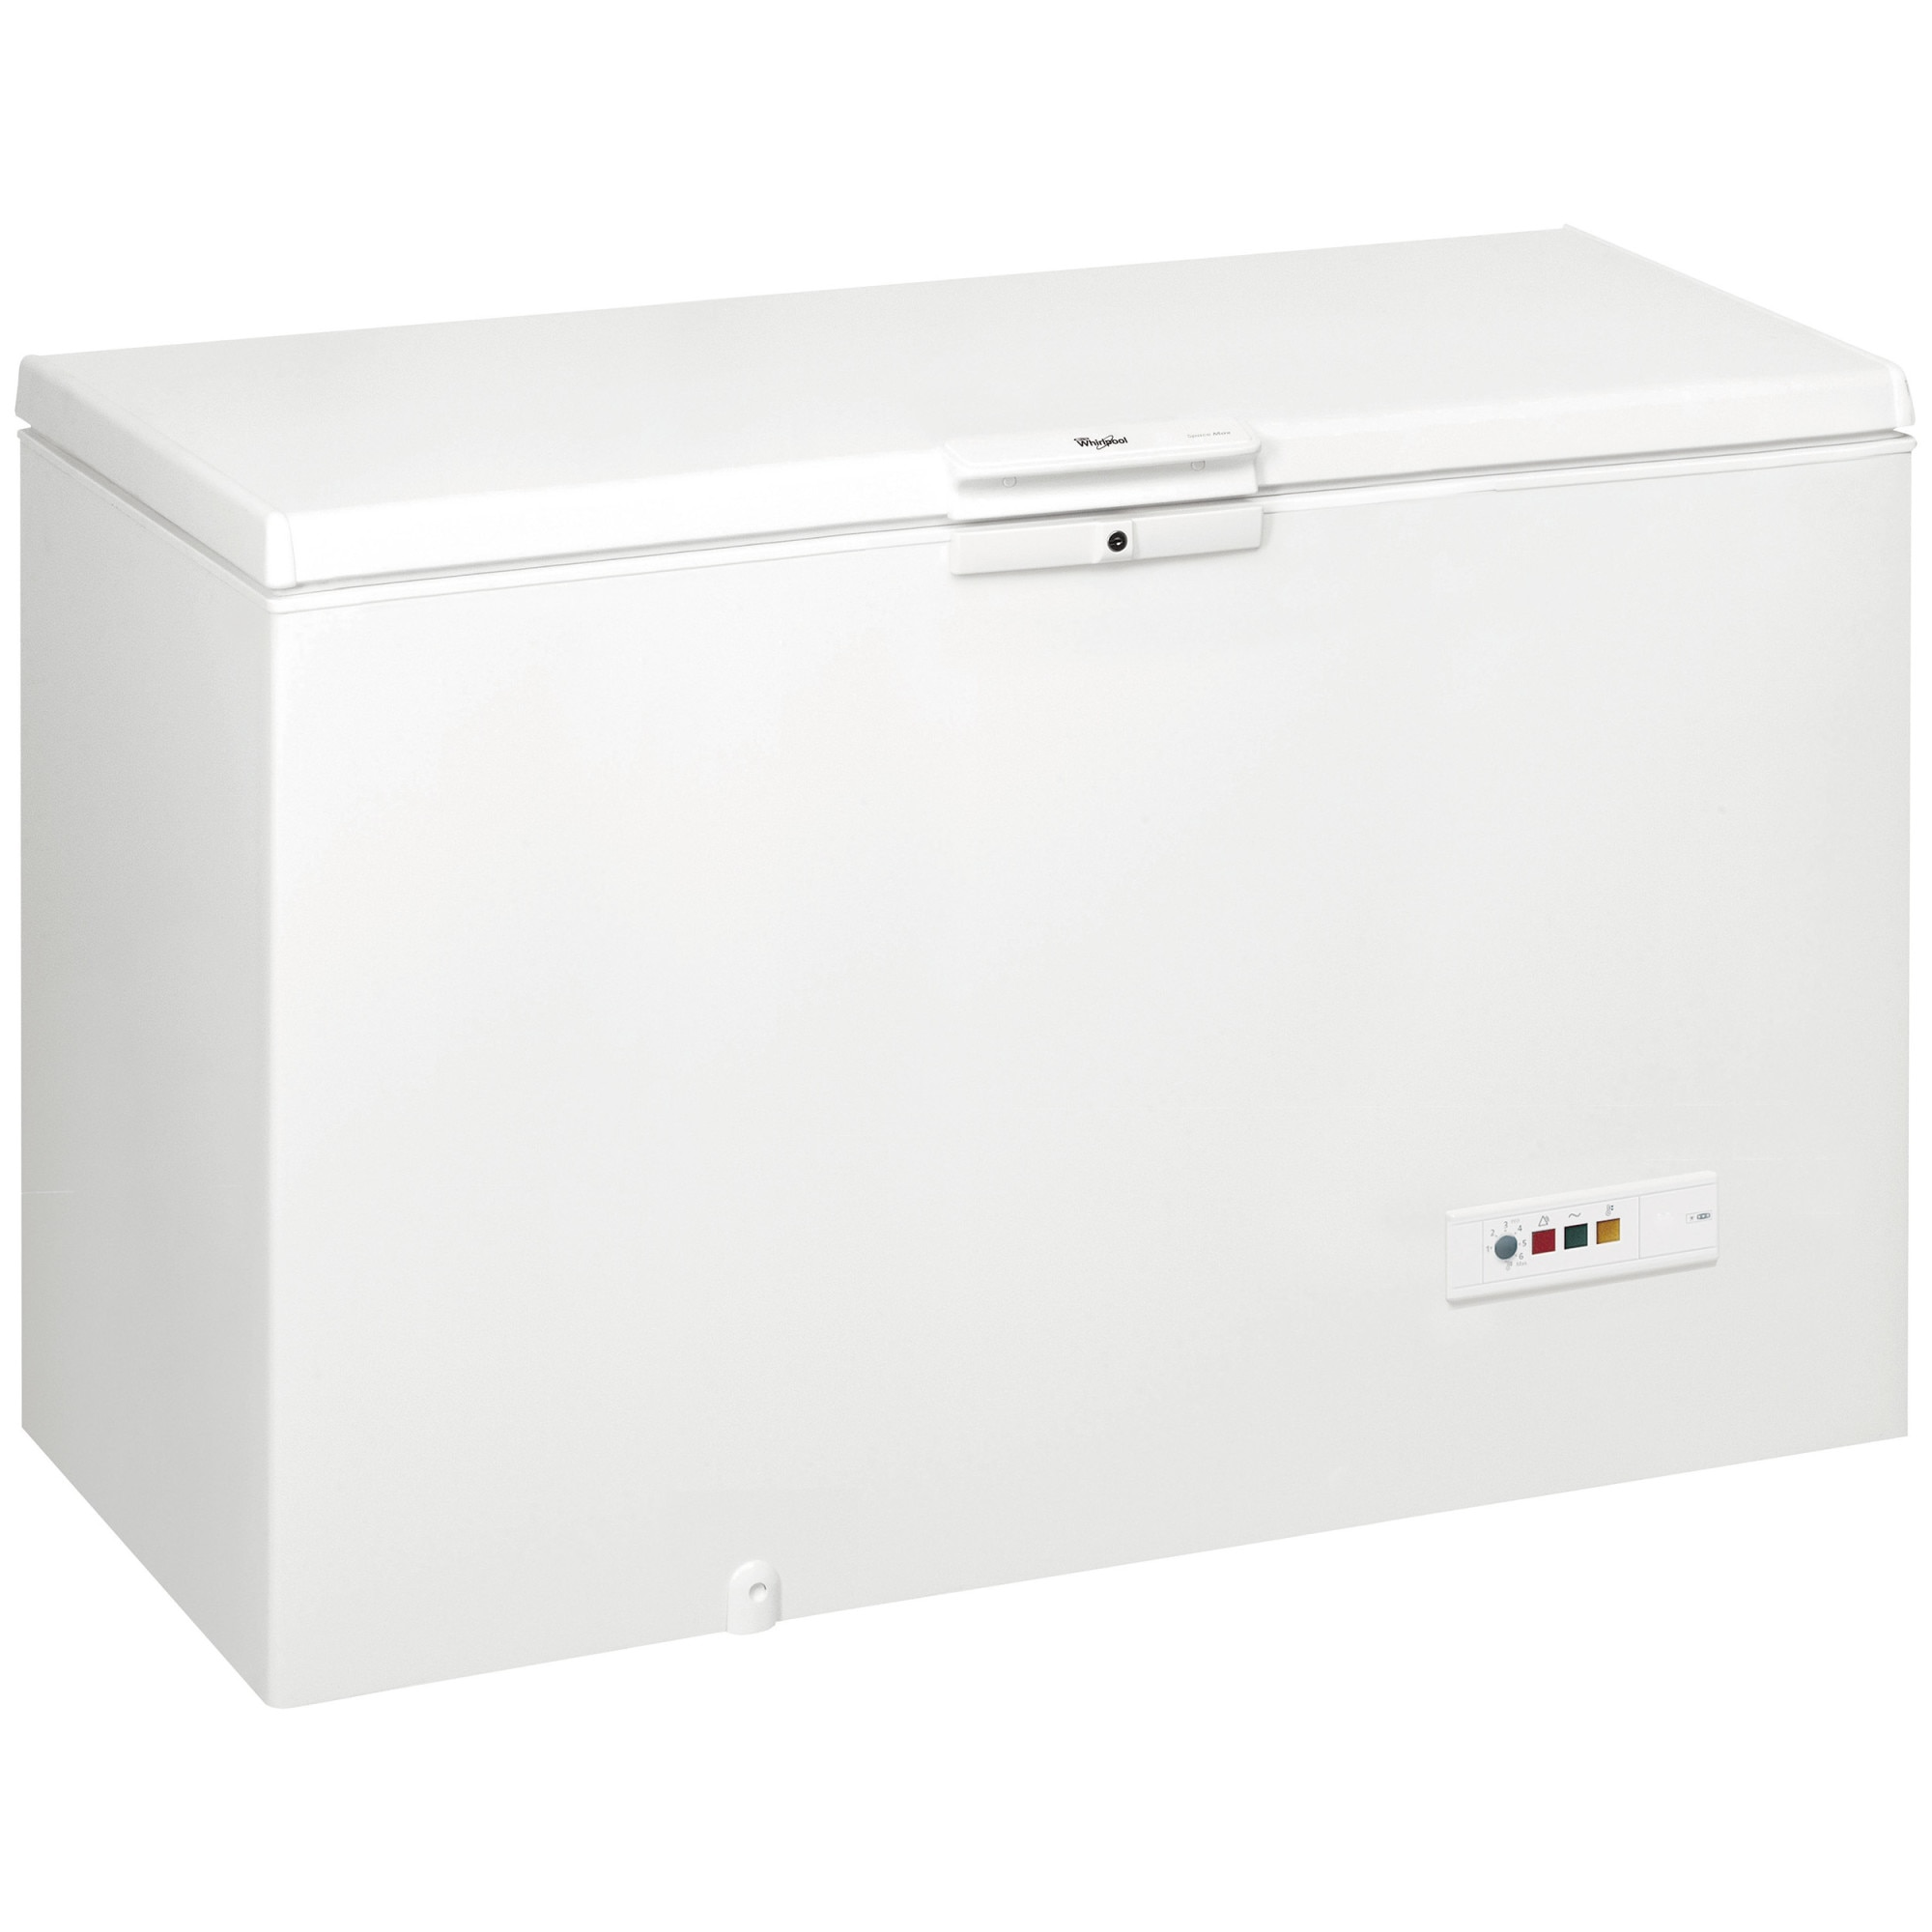 Fotografie Lada frigorifica Whirlpool WHM3911, 390 l, Clasa A+, Alb